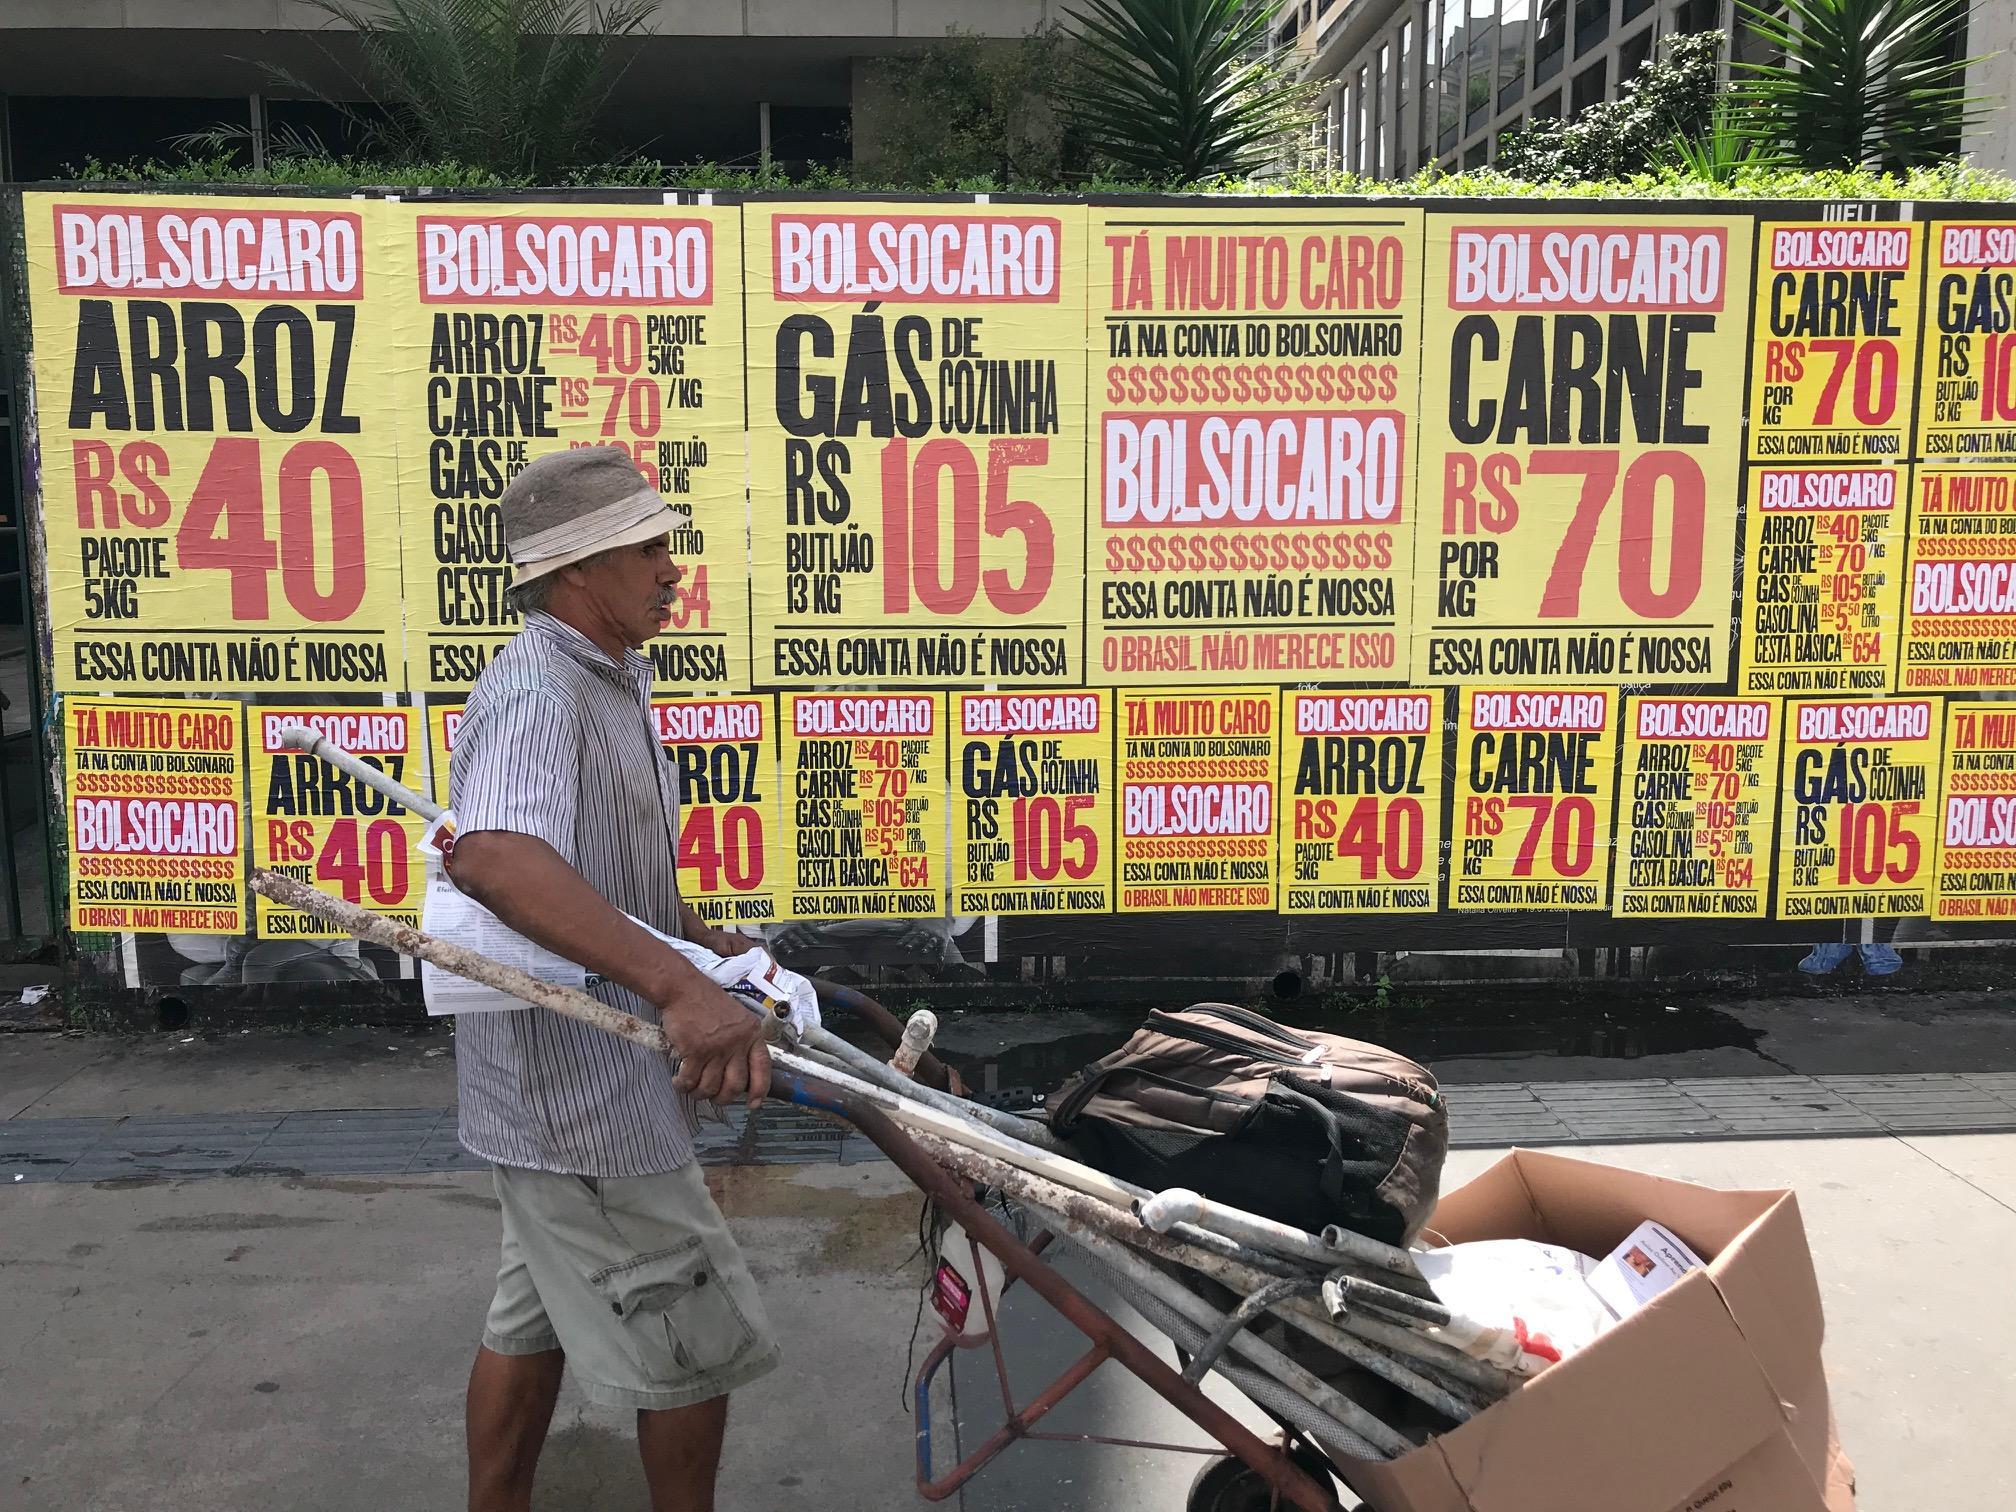 Protesto na Avenida Paulista reforça preços absurdos cobrados no Brasil